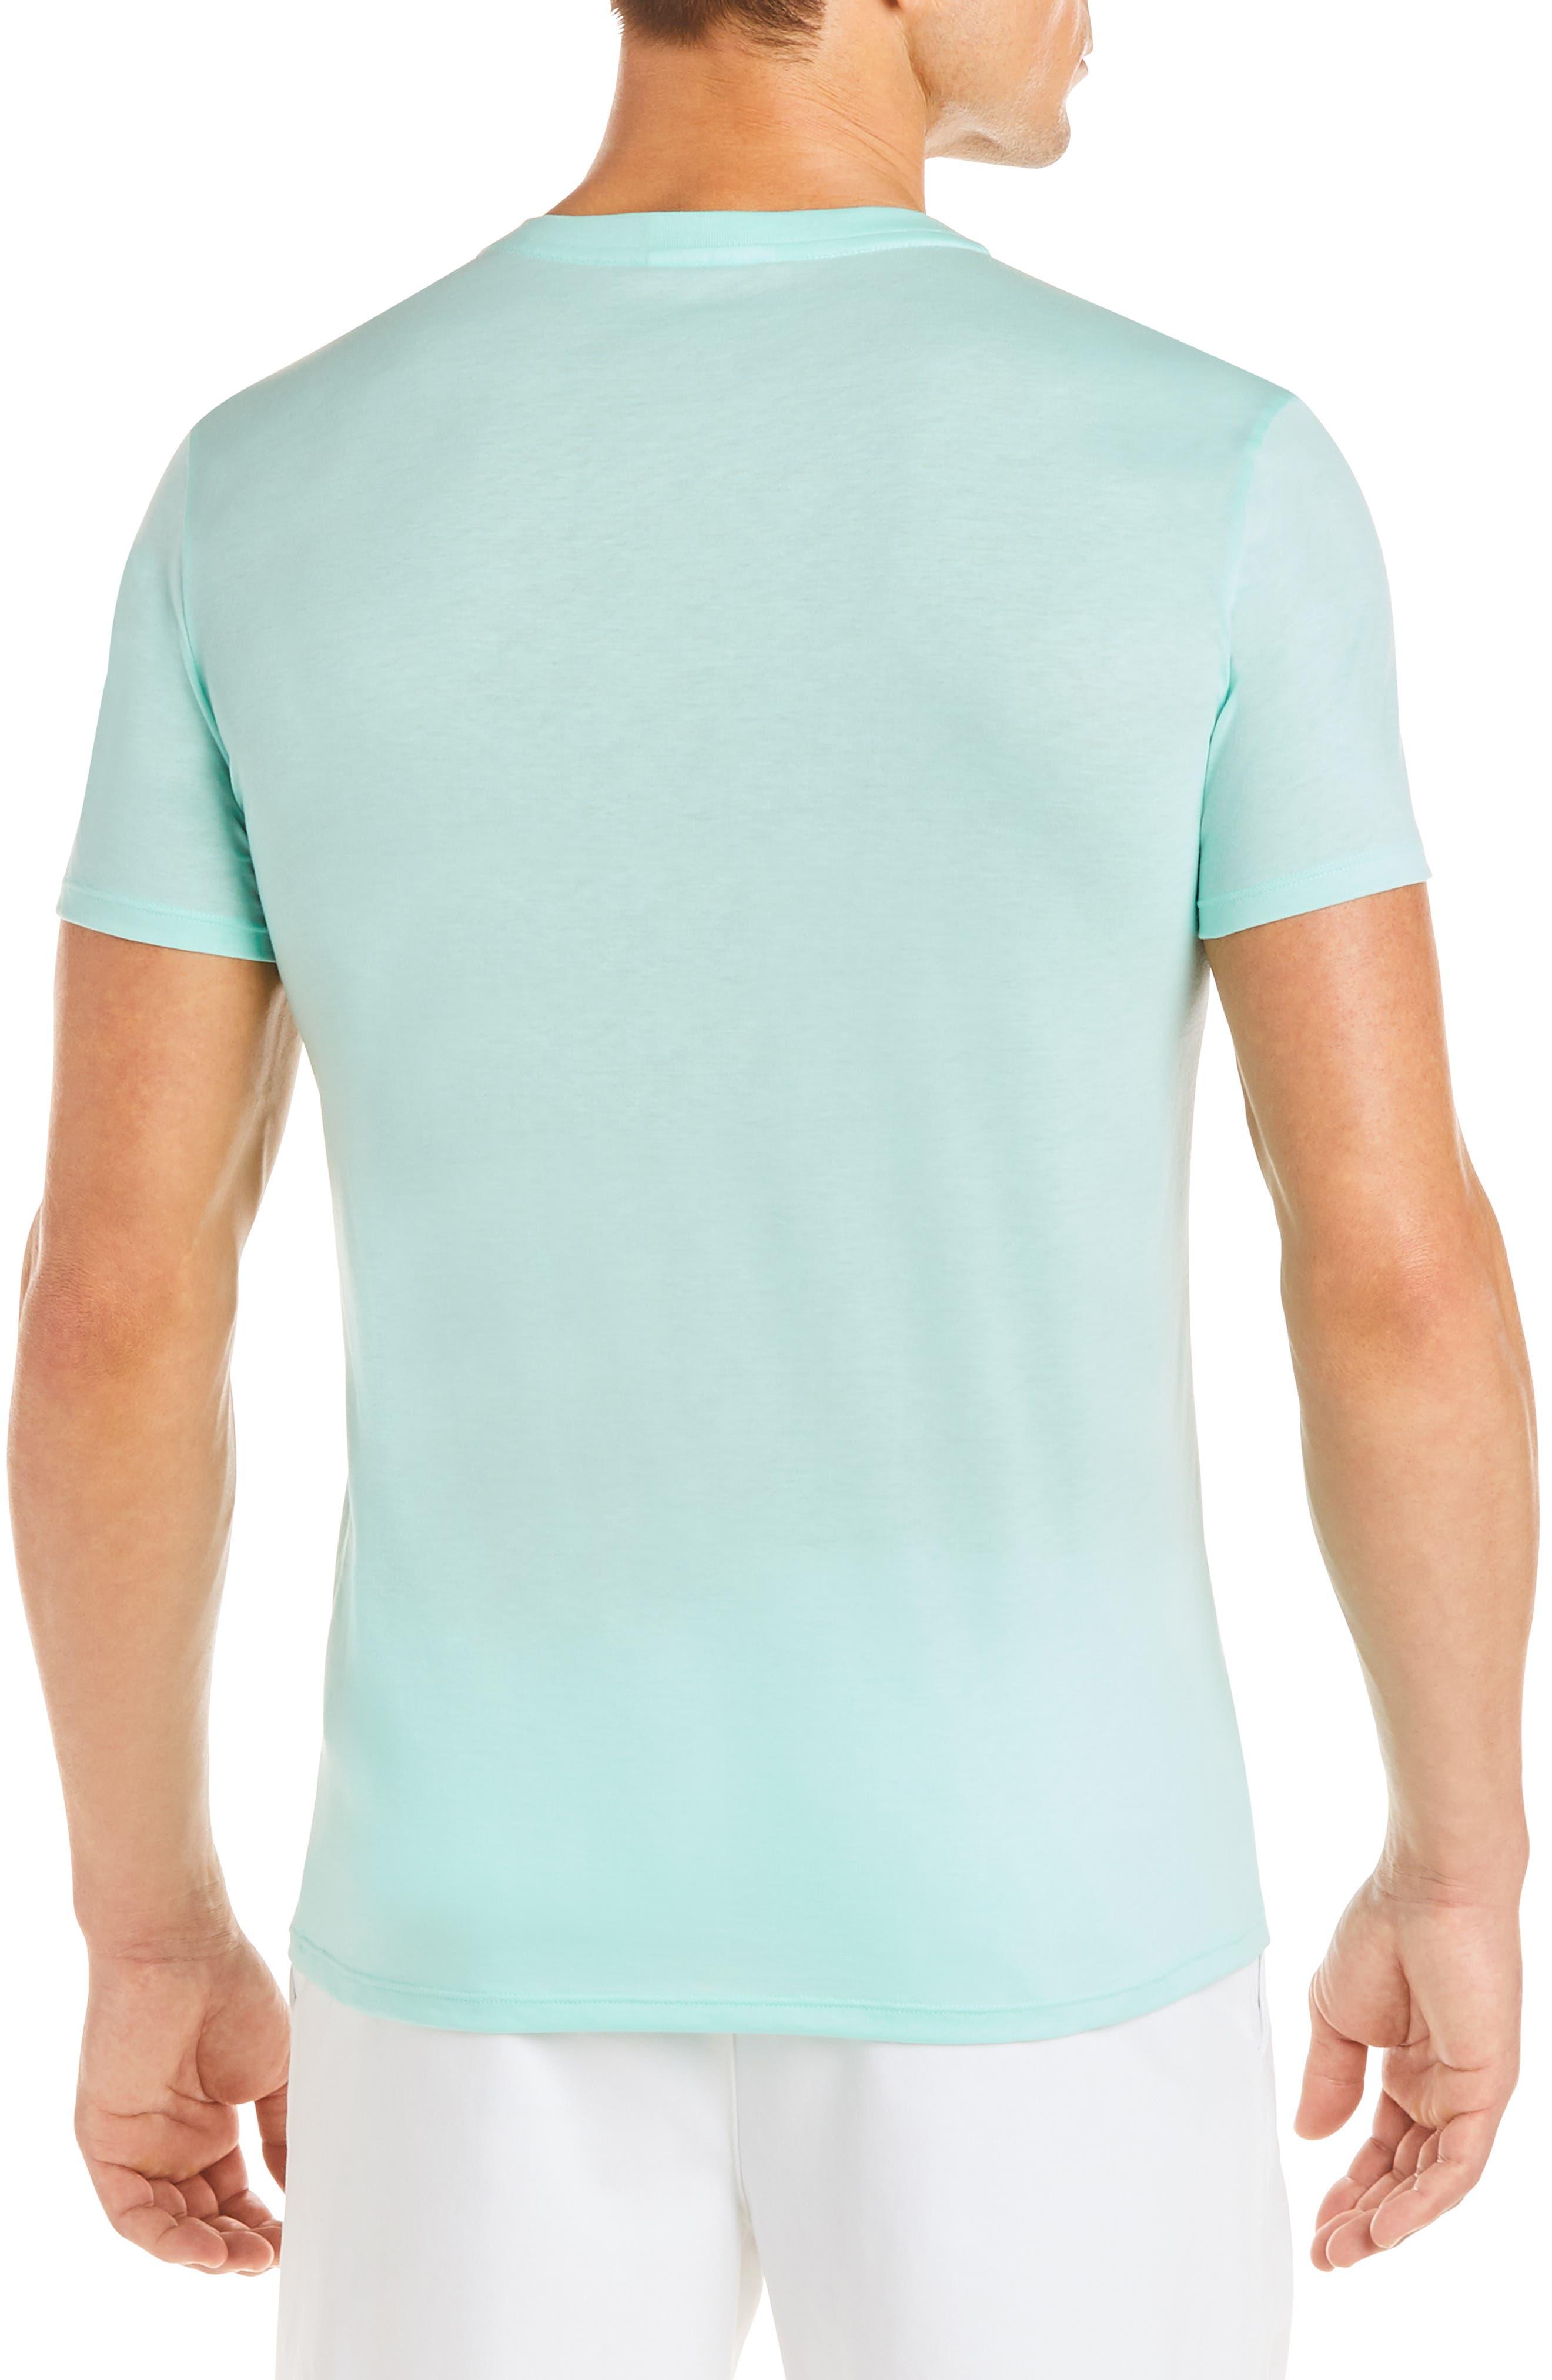 Lacoste 3-Pc Essentials White Cotton Crew Neck Short Sleeve T-Shirt